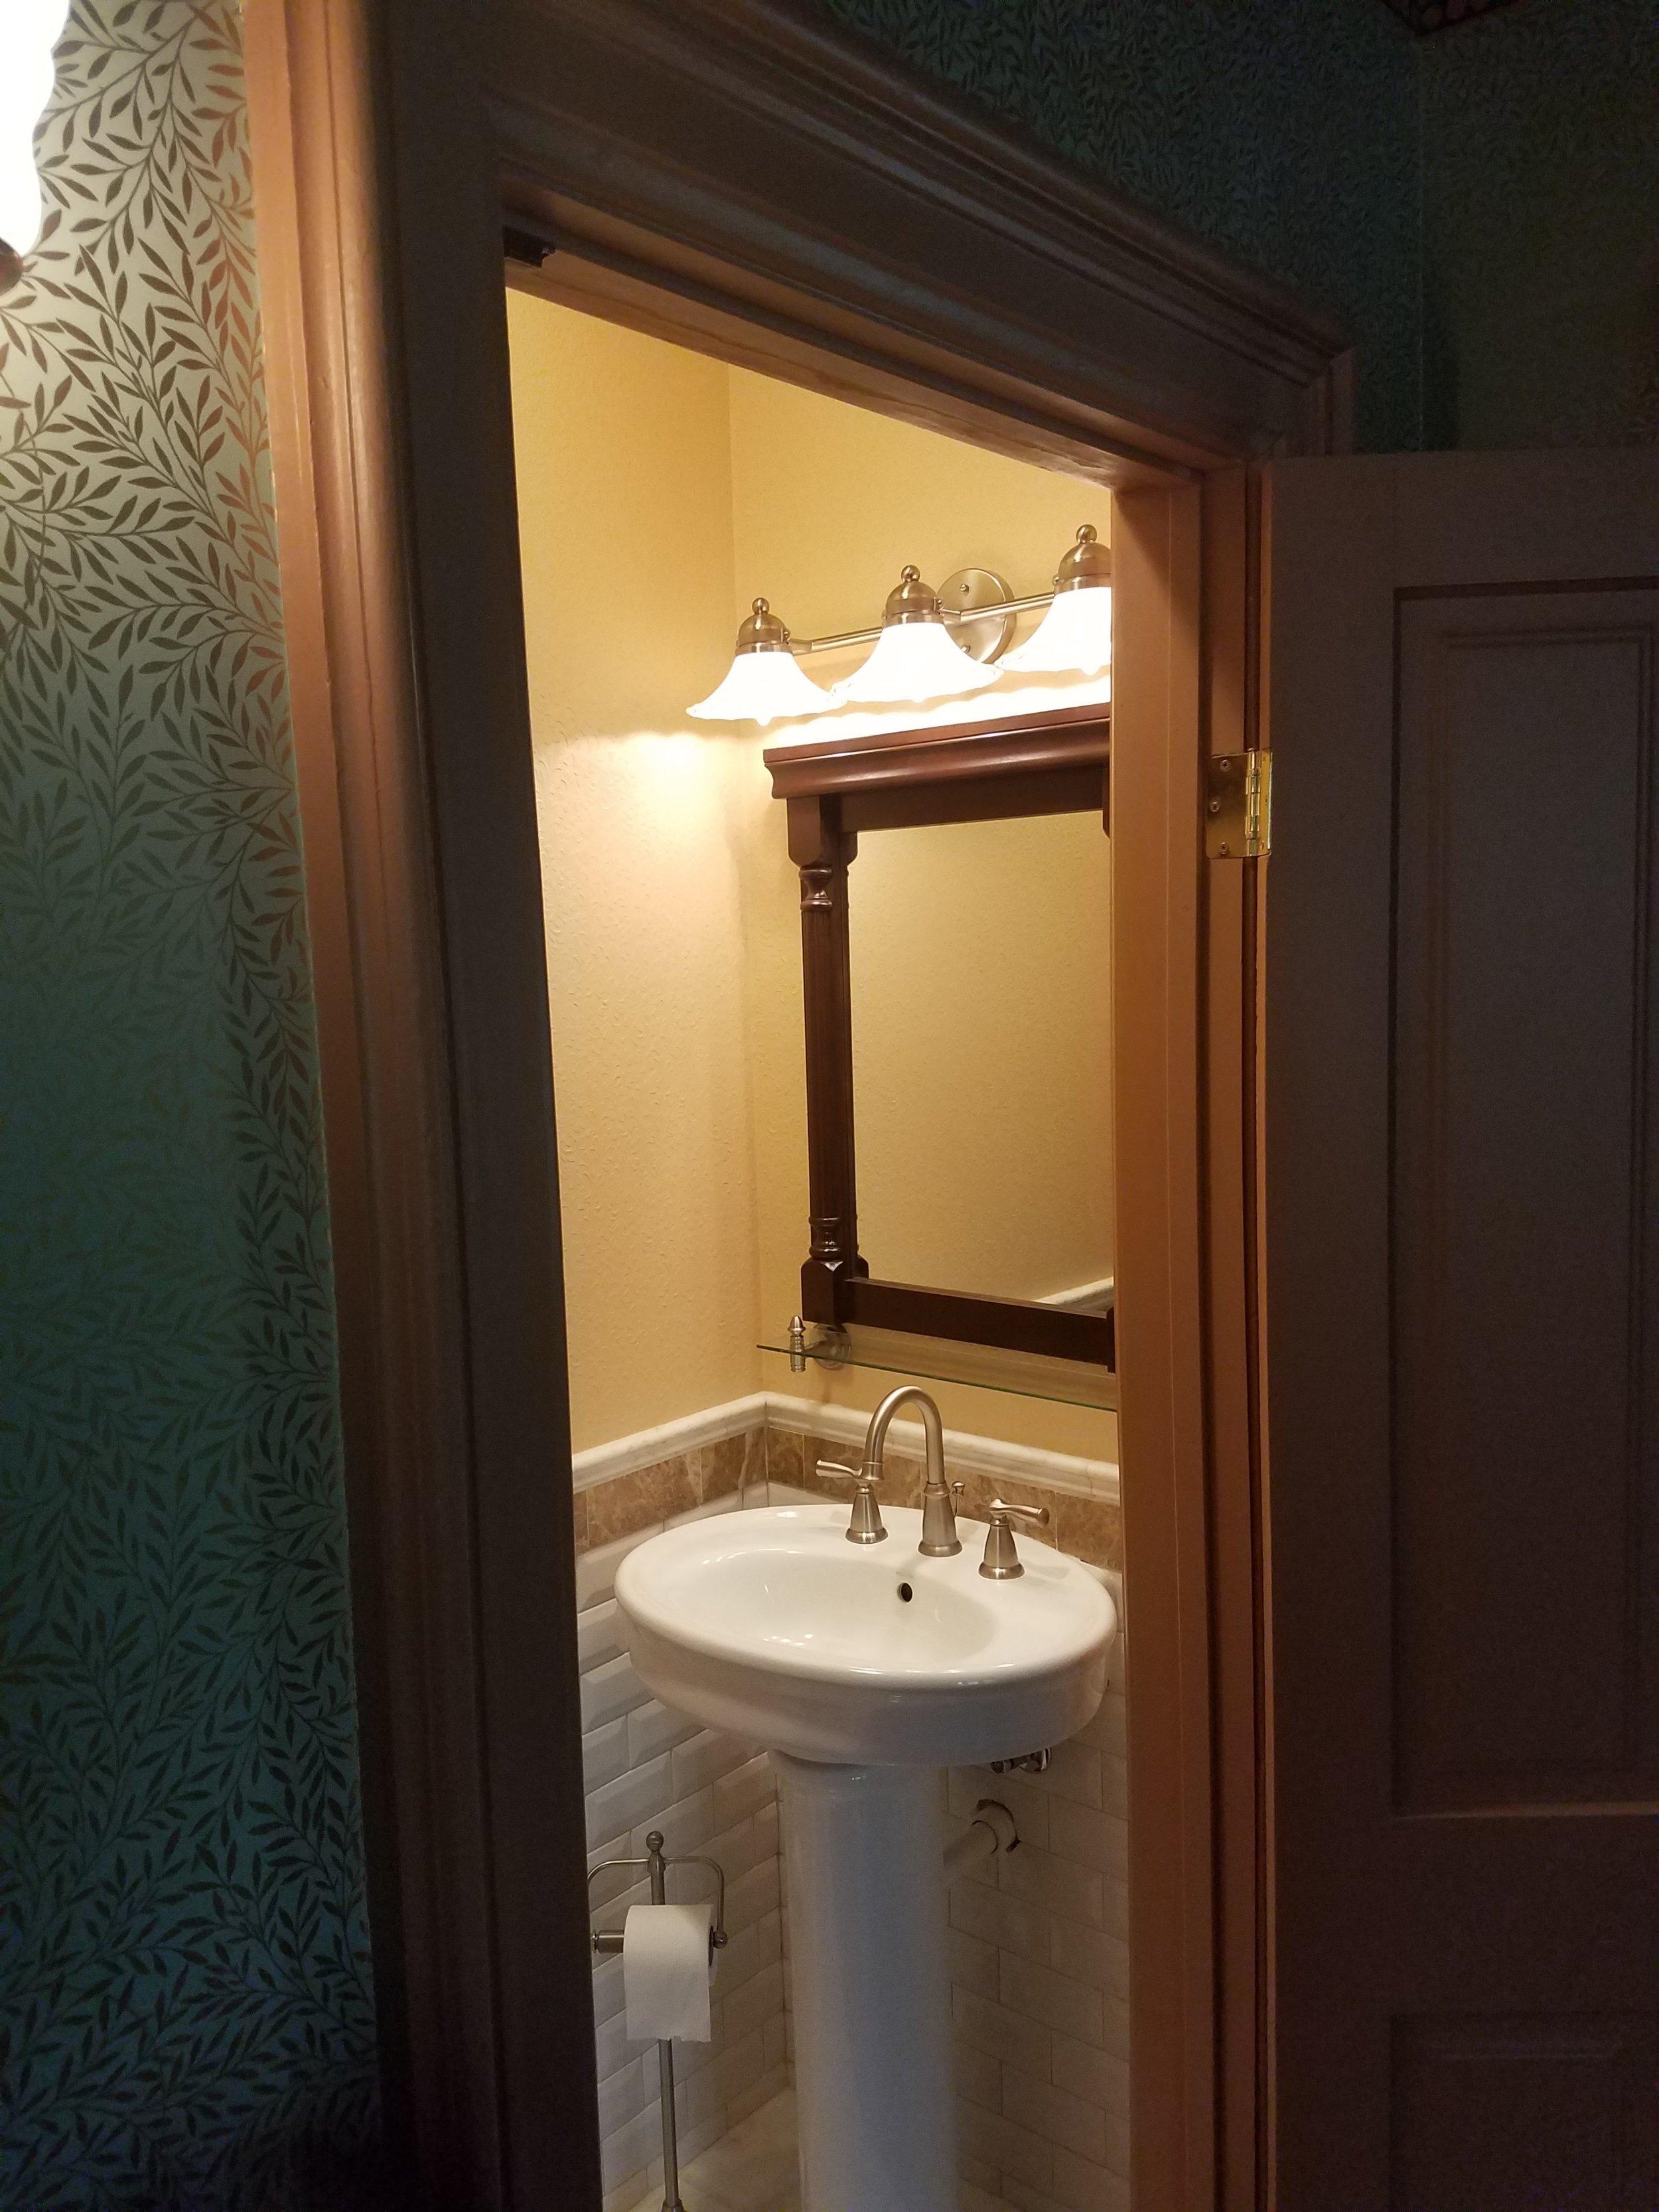 Pedastall sink and mirror